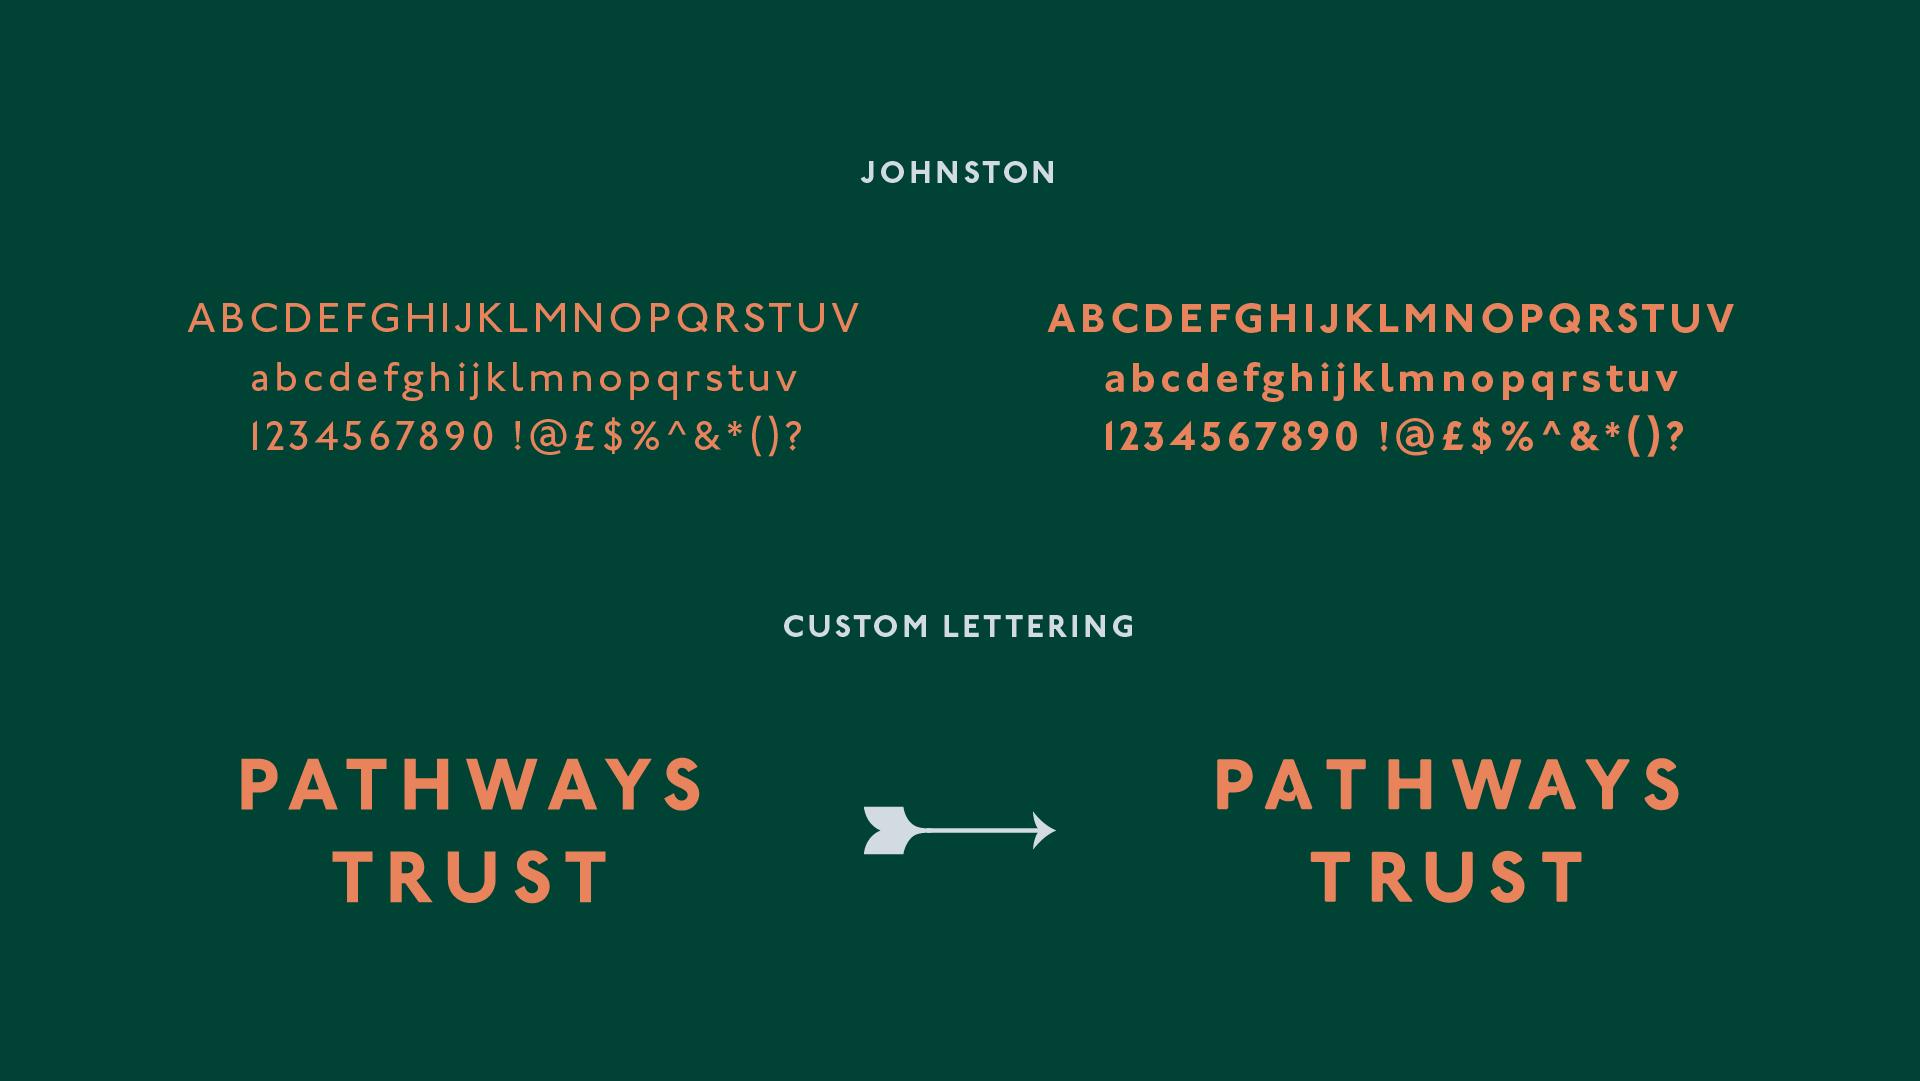 Pathways Trust Johnston Typography Font